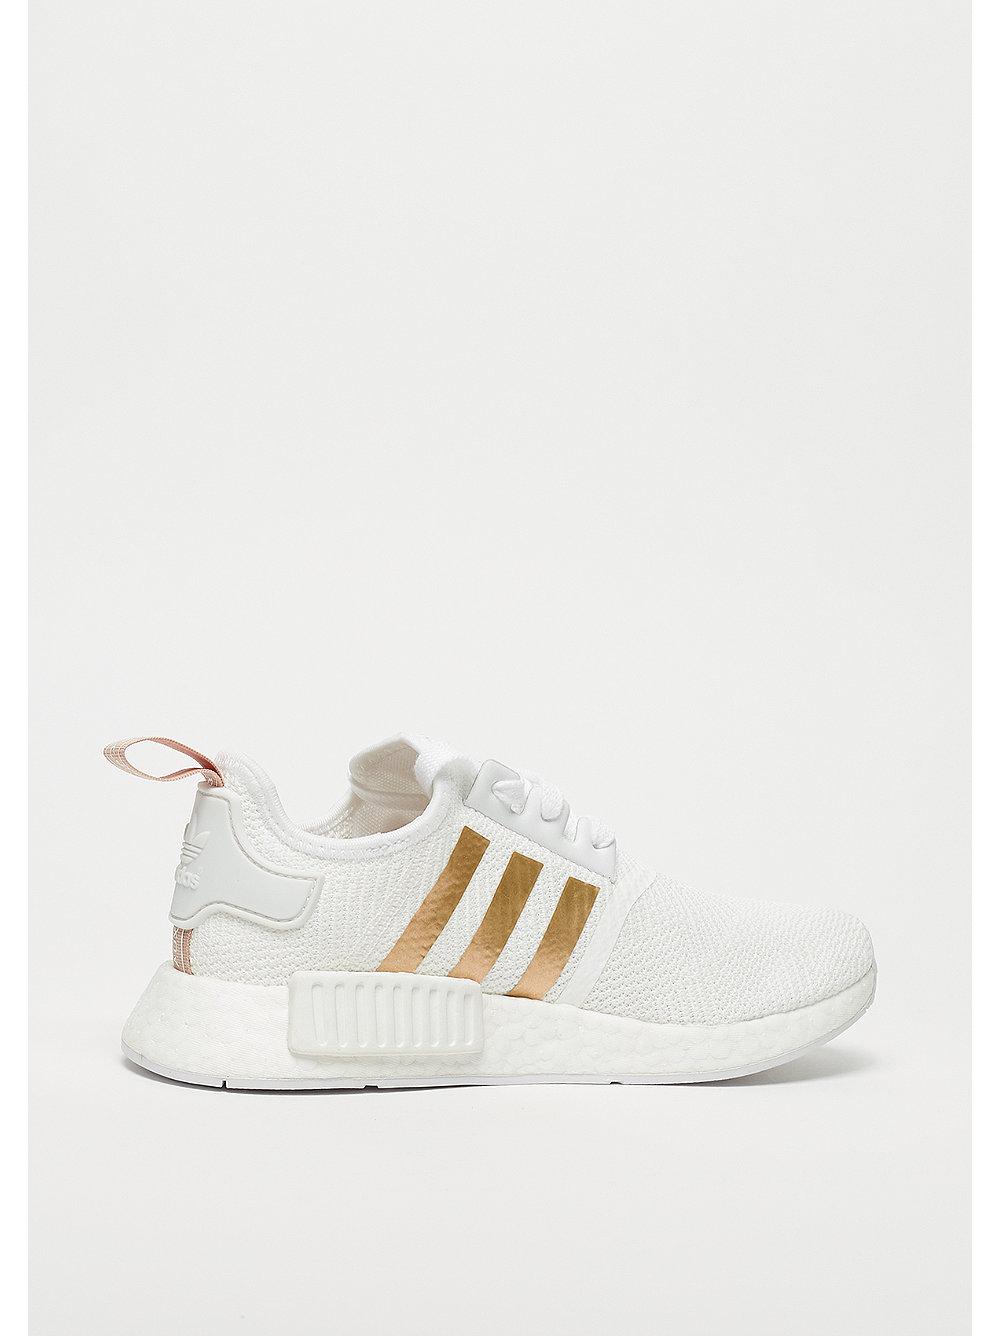 various colors 09bc7 e8bea adidas NMD R1 W ftwr white schoenen bij SNIPES